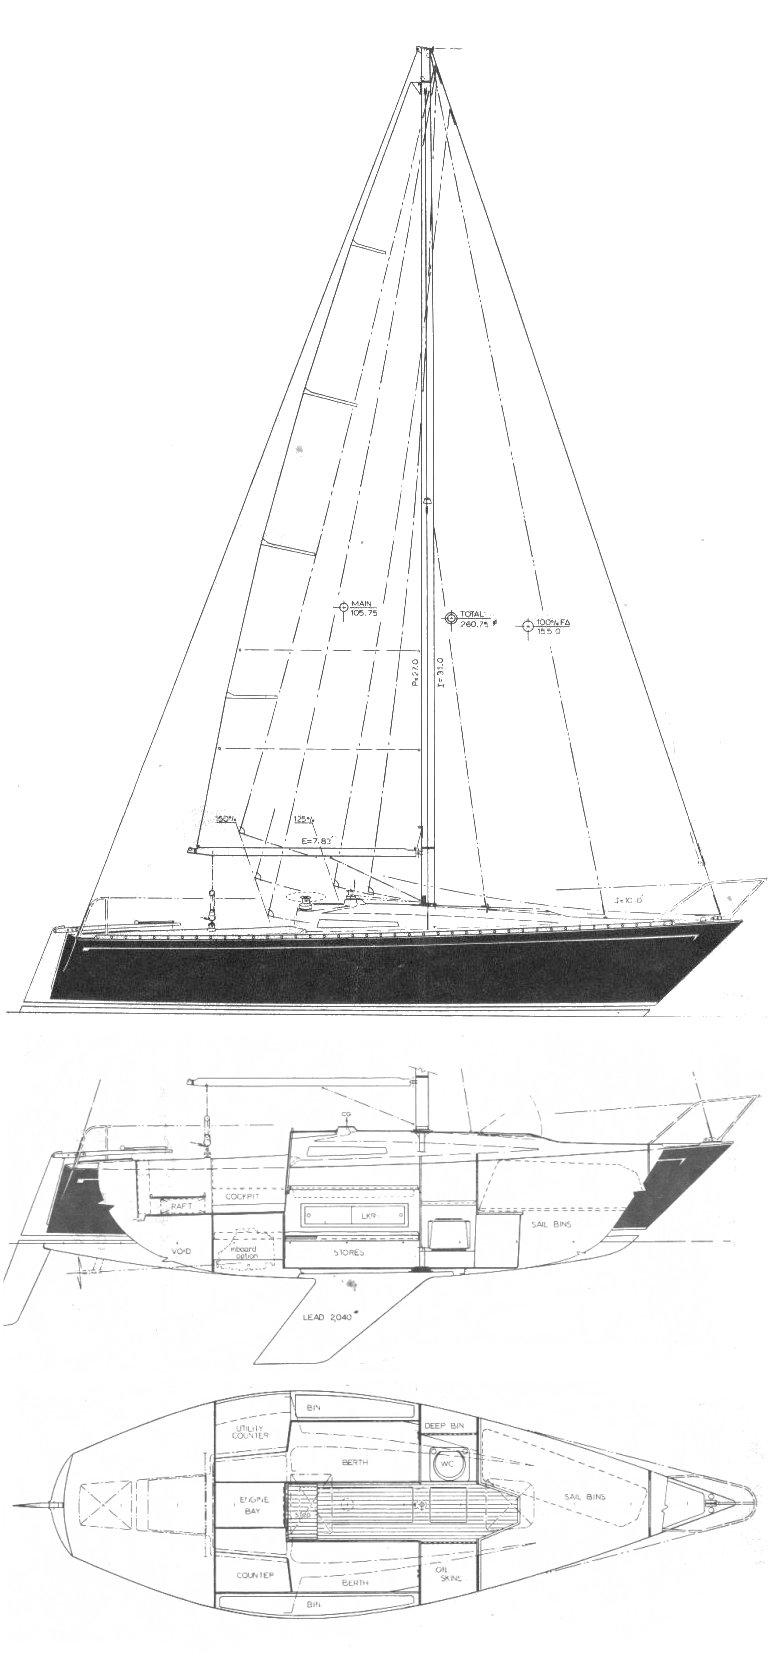 SANTANA 25-2 drawing